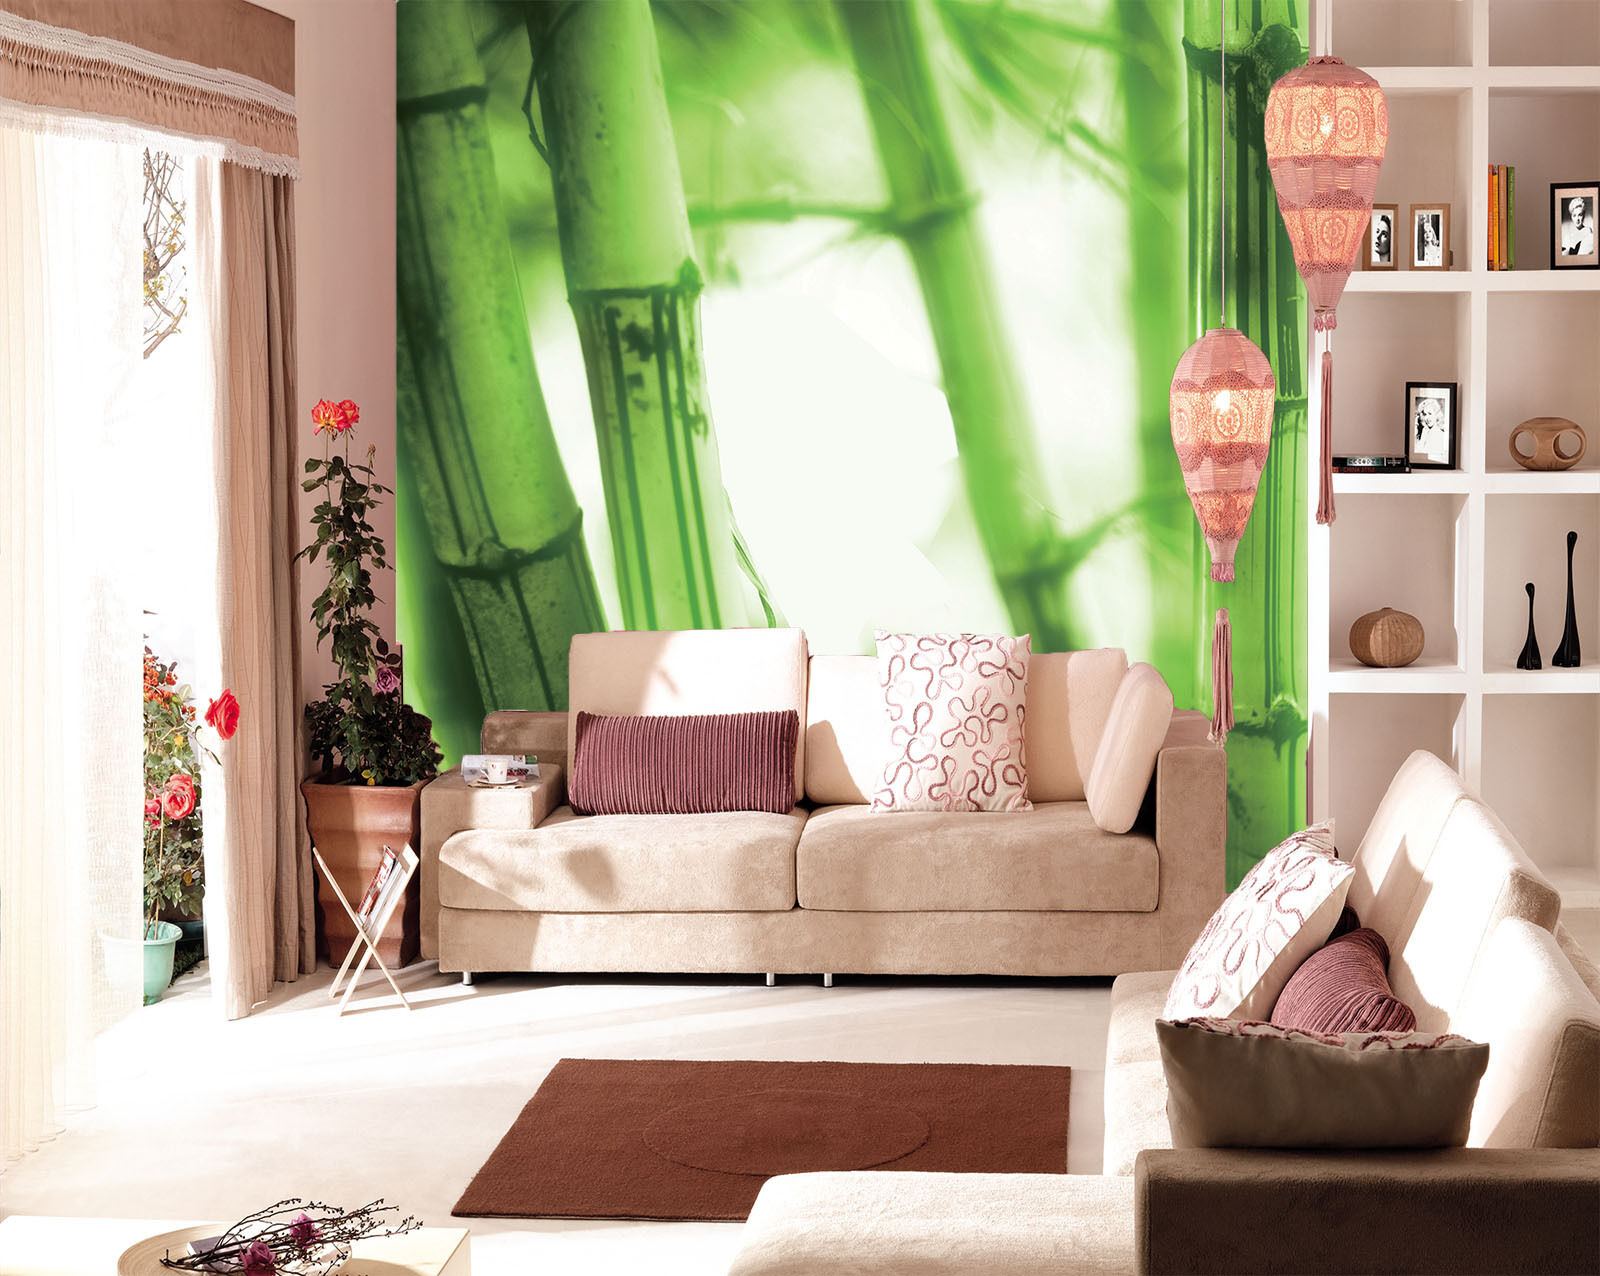 3D Der bambus 65746 Fototapeten Wandbild Fototapete BildTapete Familie DE